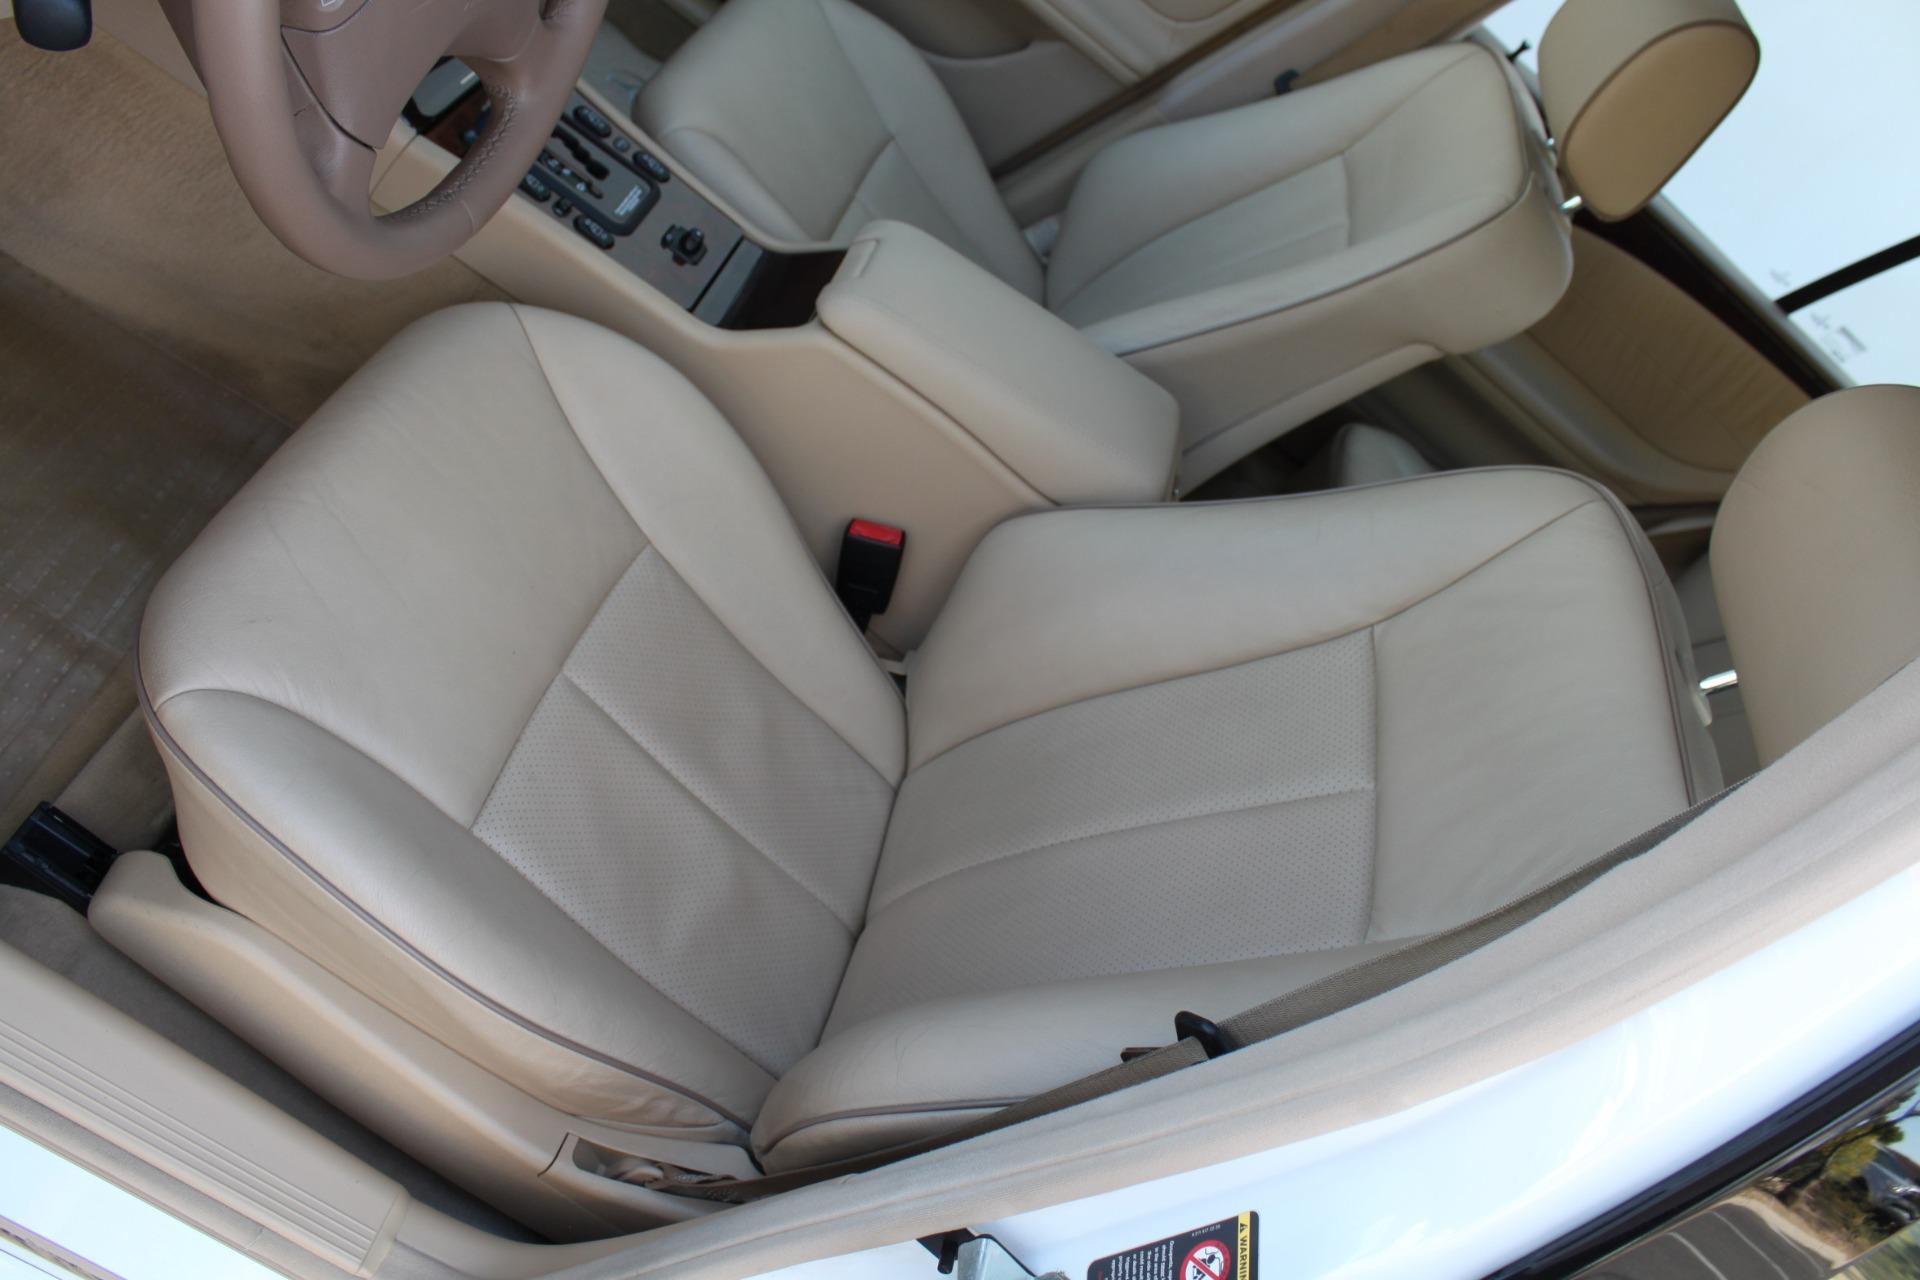 Used-2000-Mercedes-Benz-E-Class-Wagon-Land-Rover